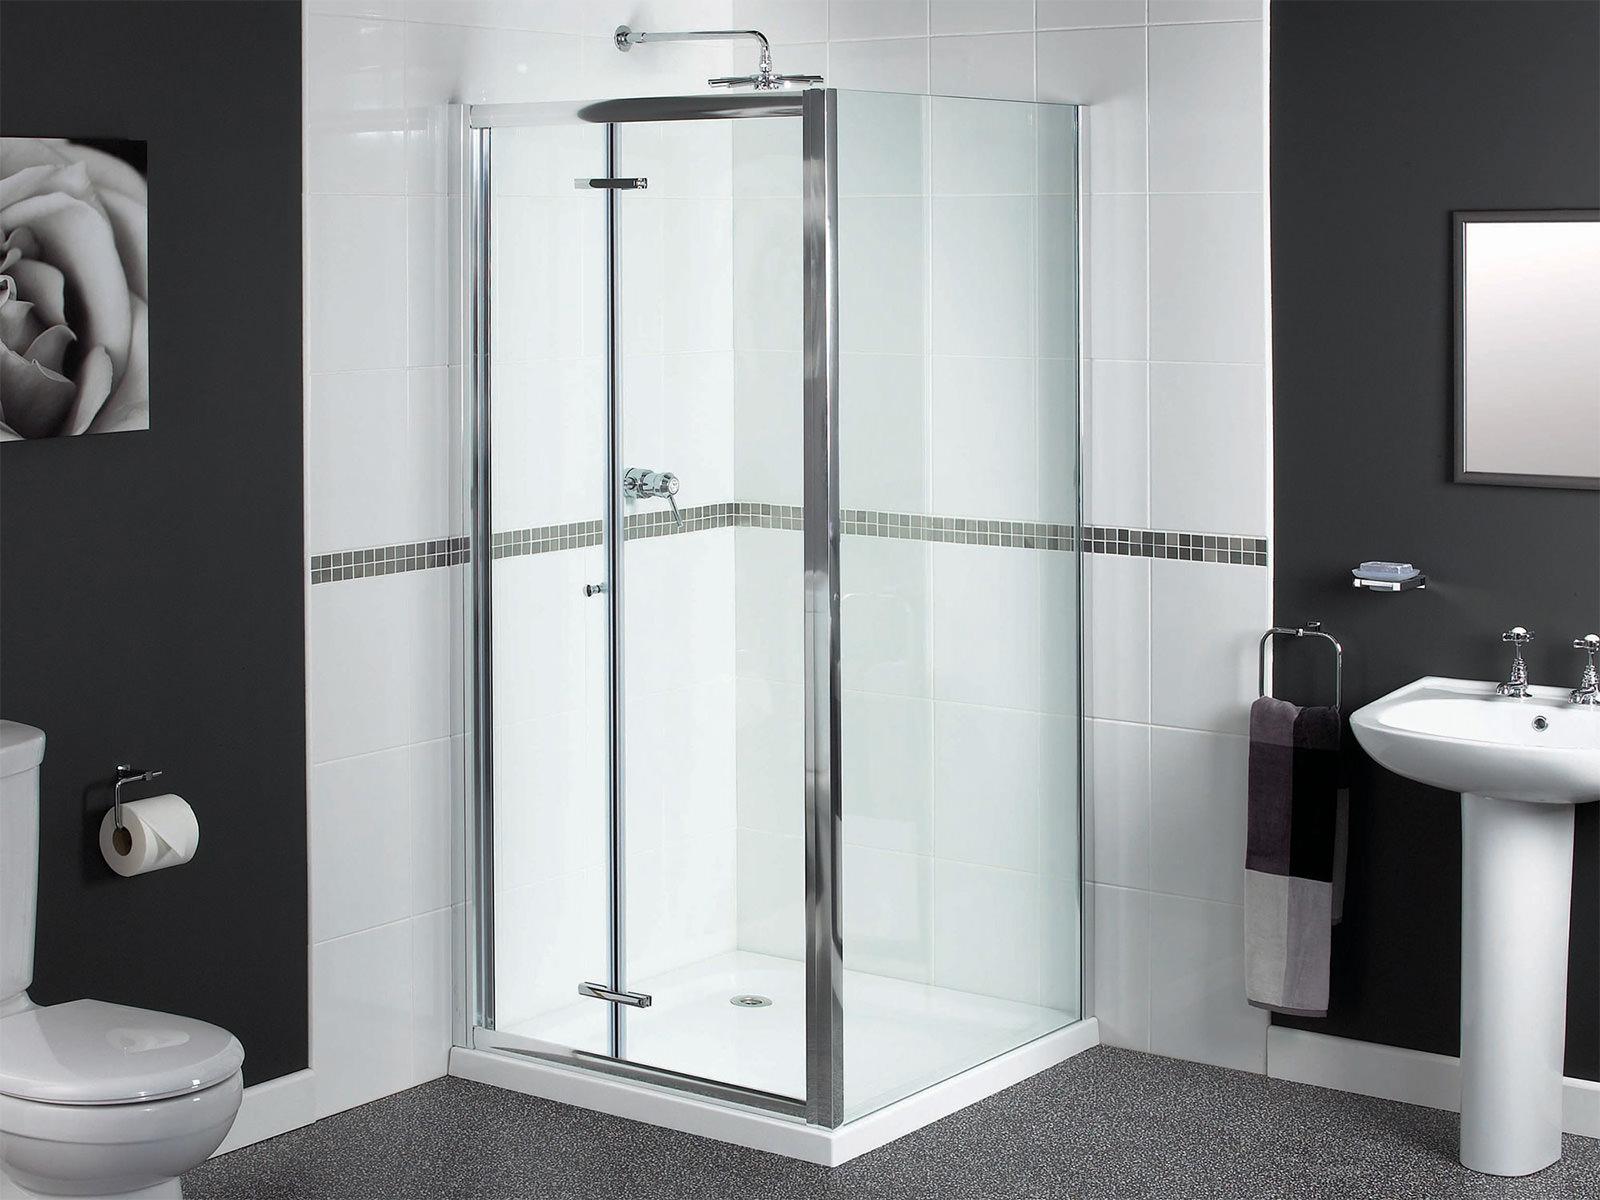 Aqualux Shine Bifold Shower Door 900mm Polished Silver Fen0900aqu